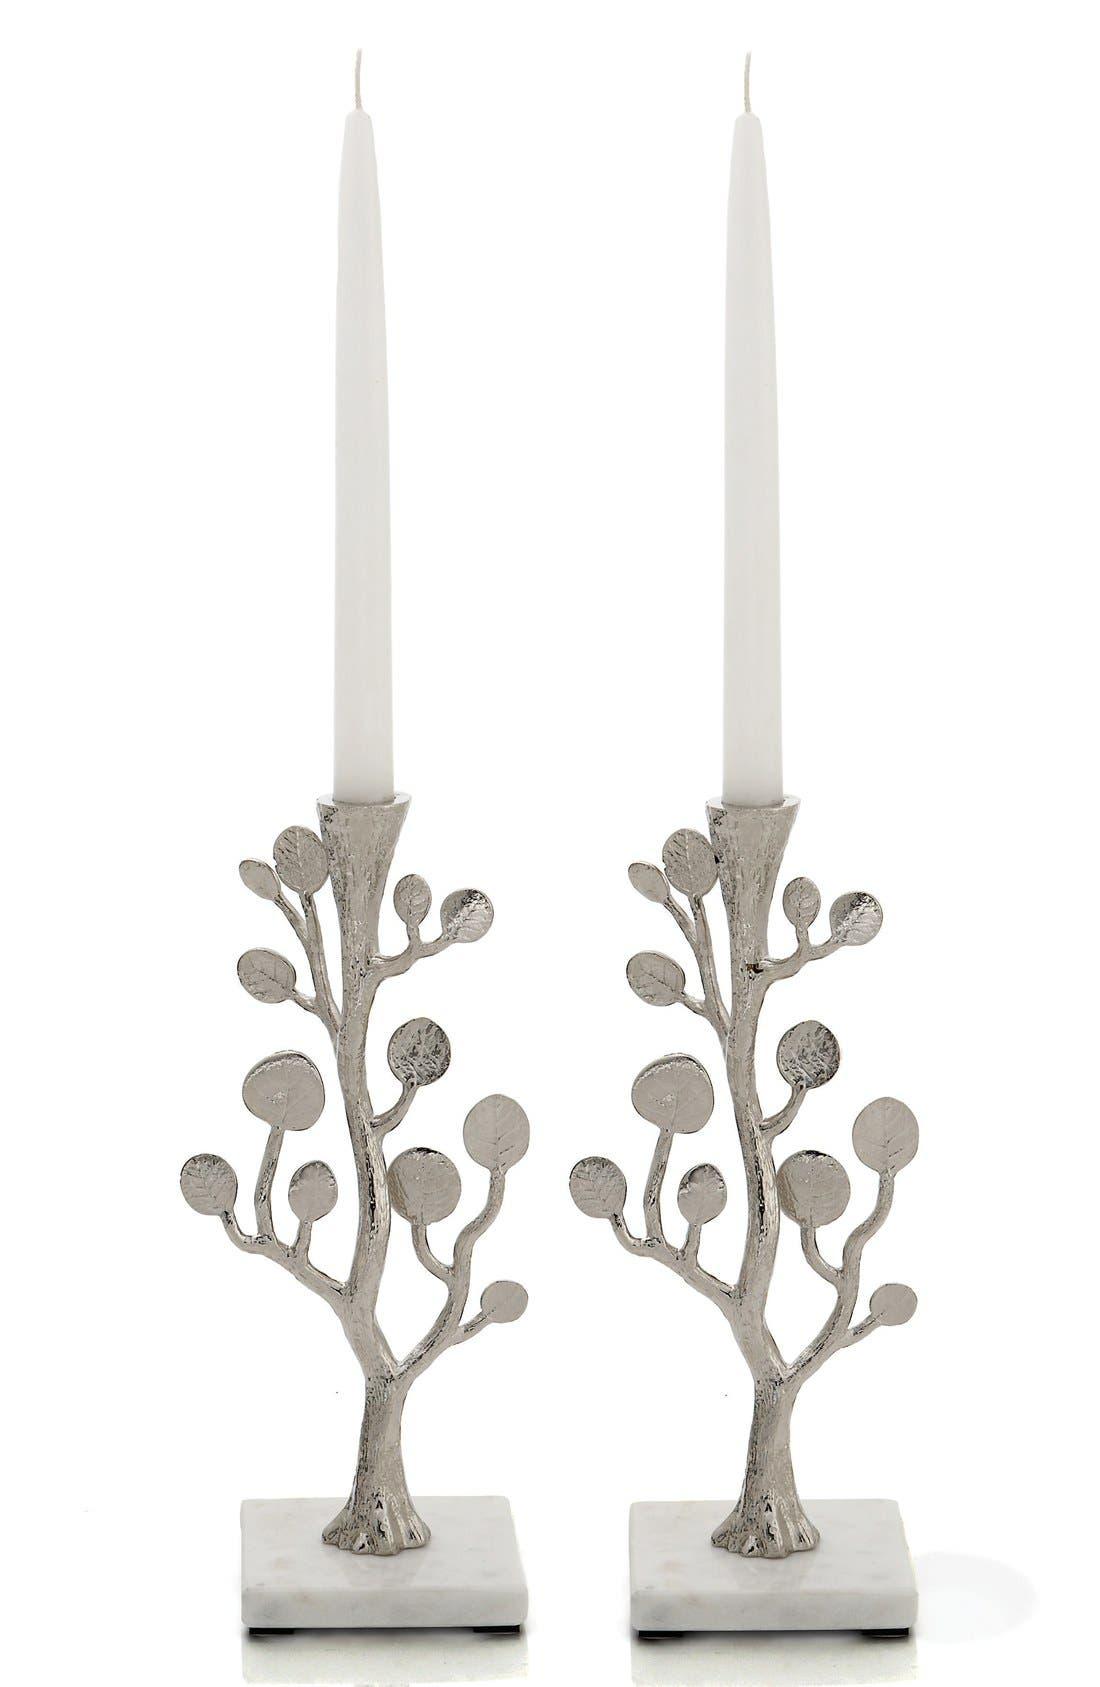 Michael Aram 'Botanical Leaf' Candle Holders (Set of 2)